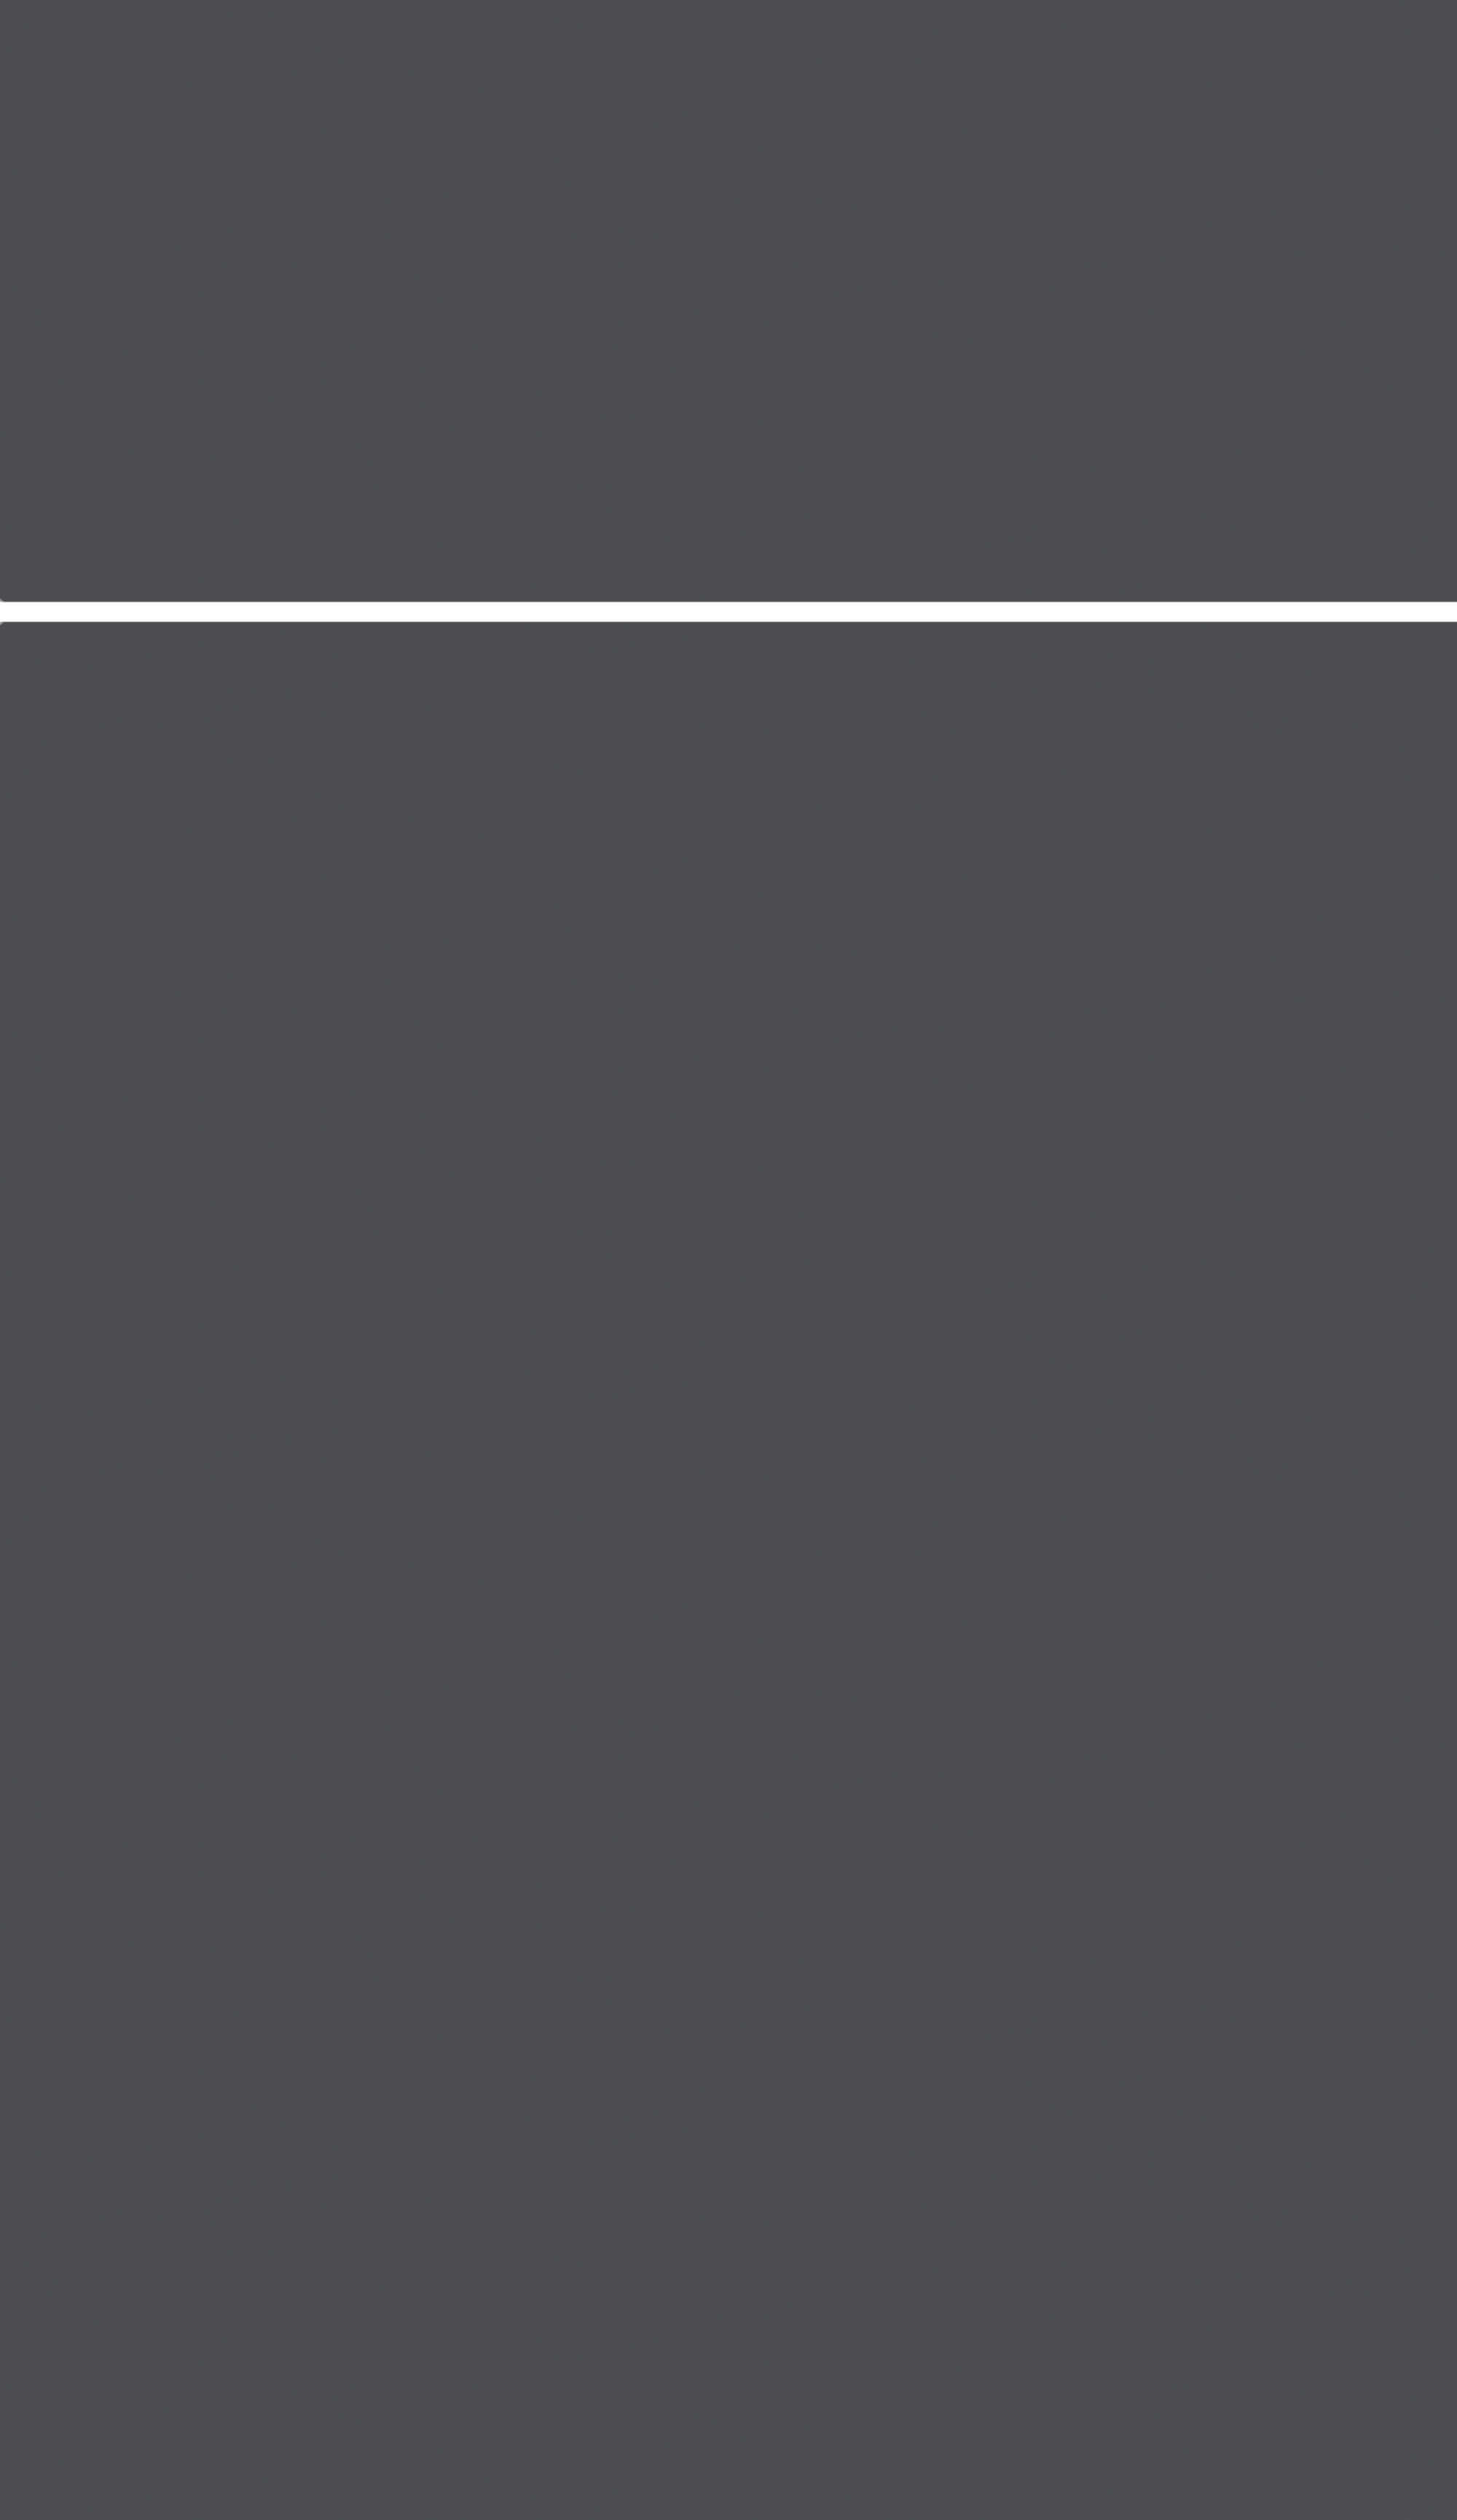 Dura Supreme's Allura door style in Dark Grey Gloss